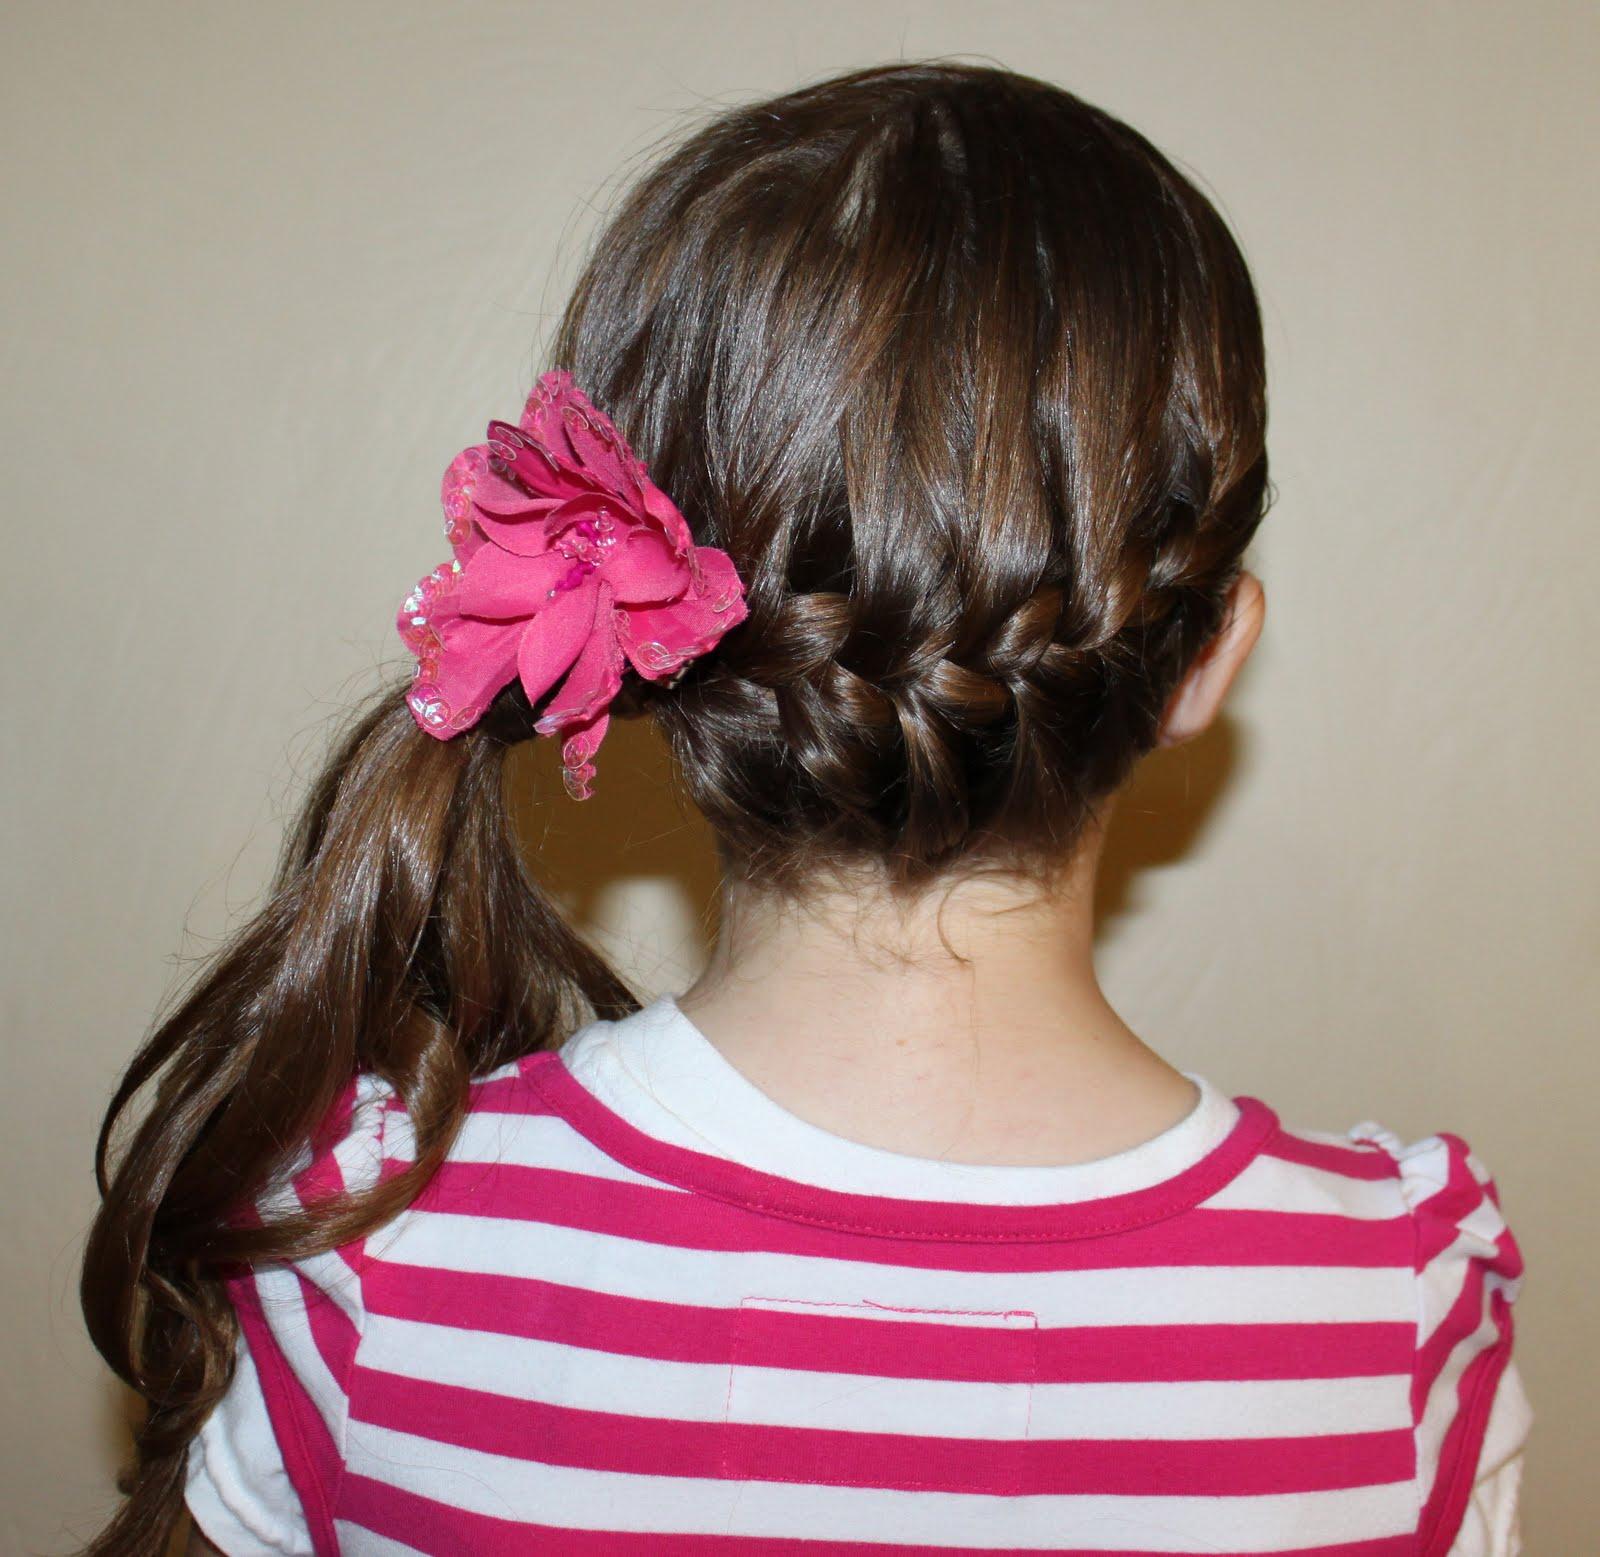 Super Side French Braid Ponytail 59644 Dfiles Short Hairstyles Gunalazisus